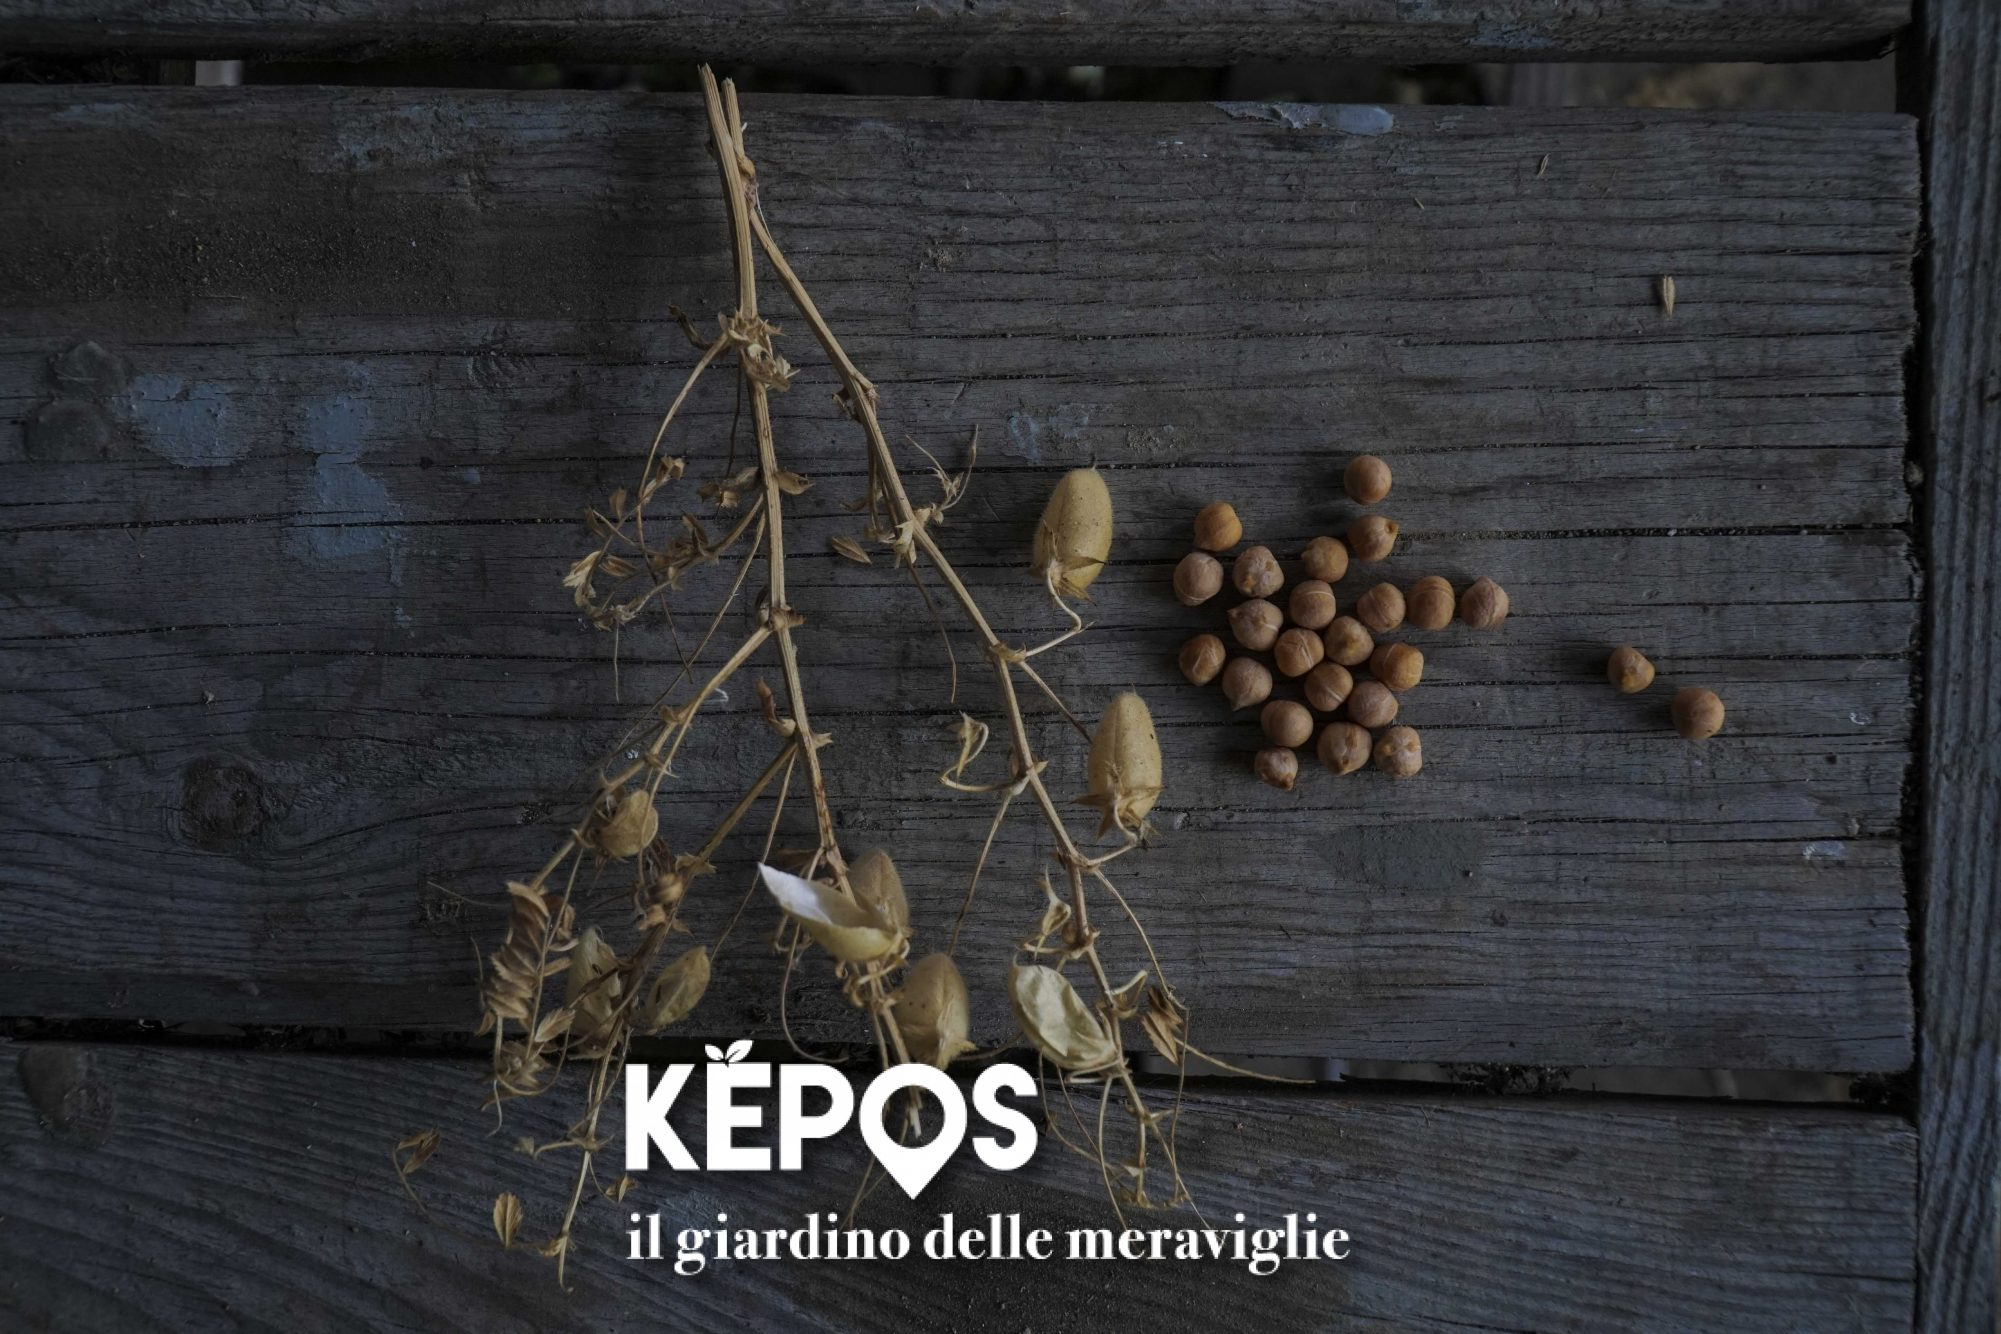 Kepos il giardino delle meraviglie - Il giardino delle meraviglie ...